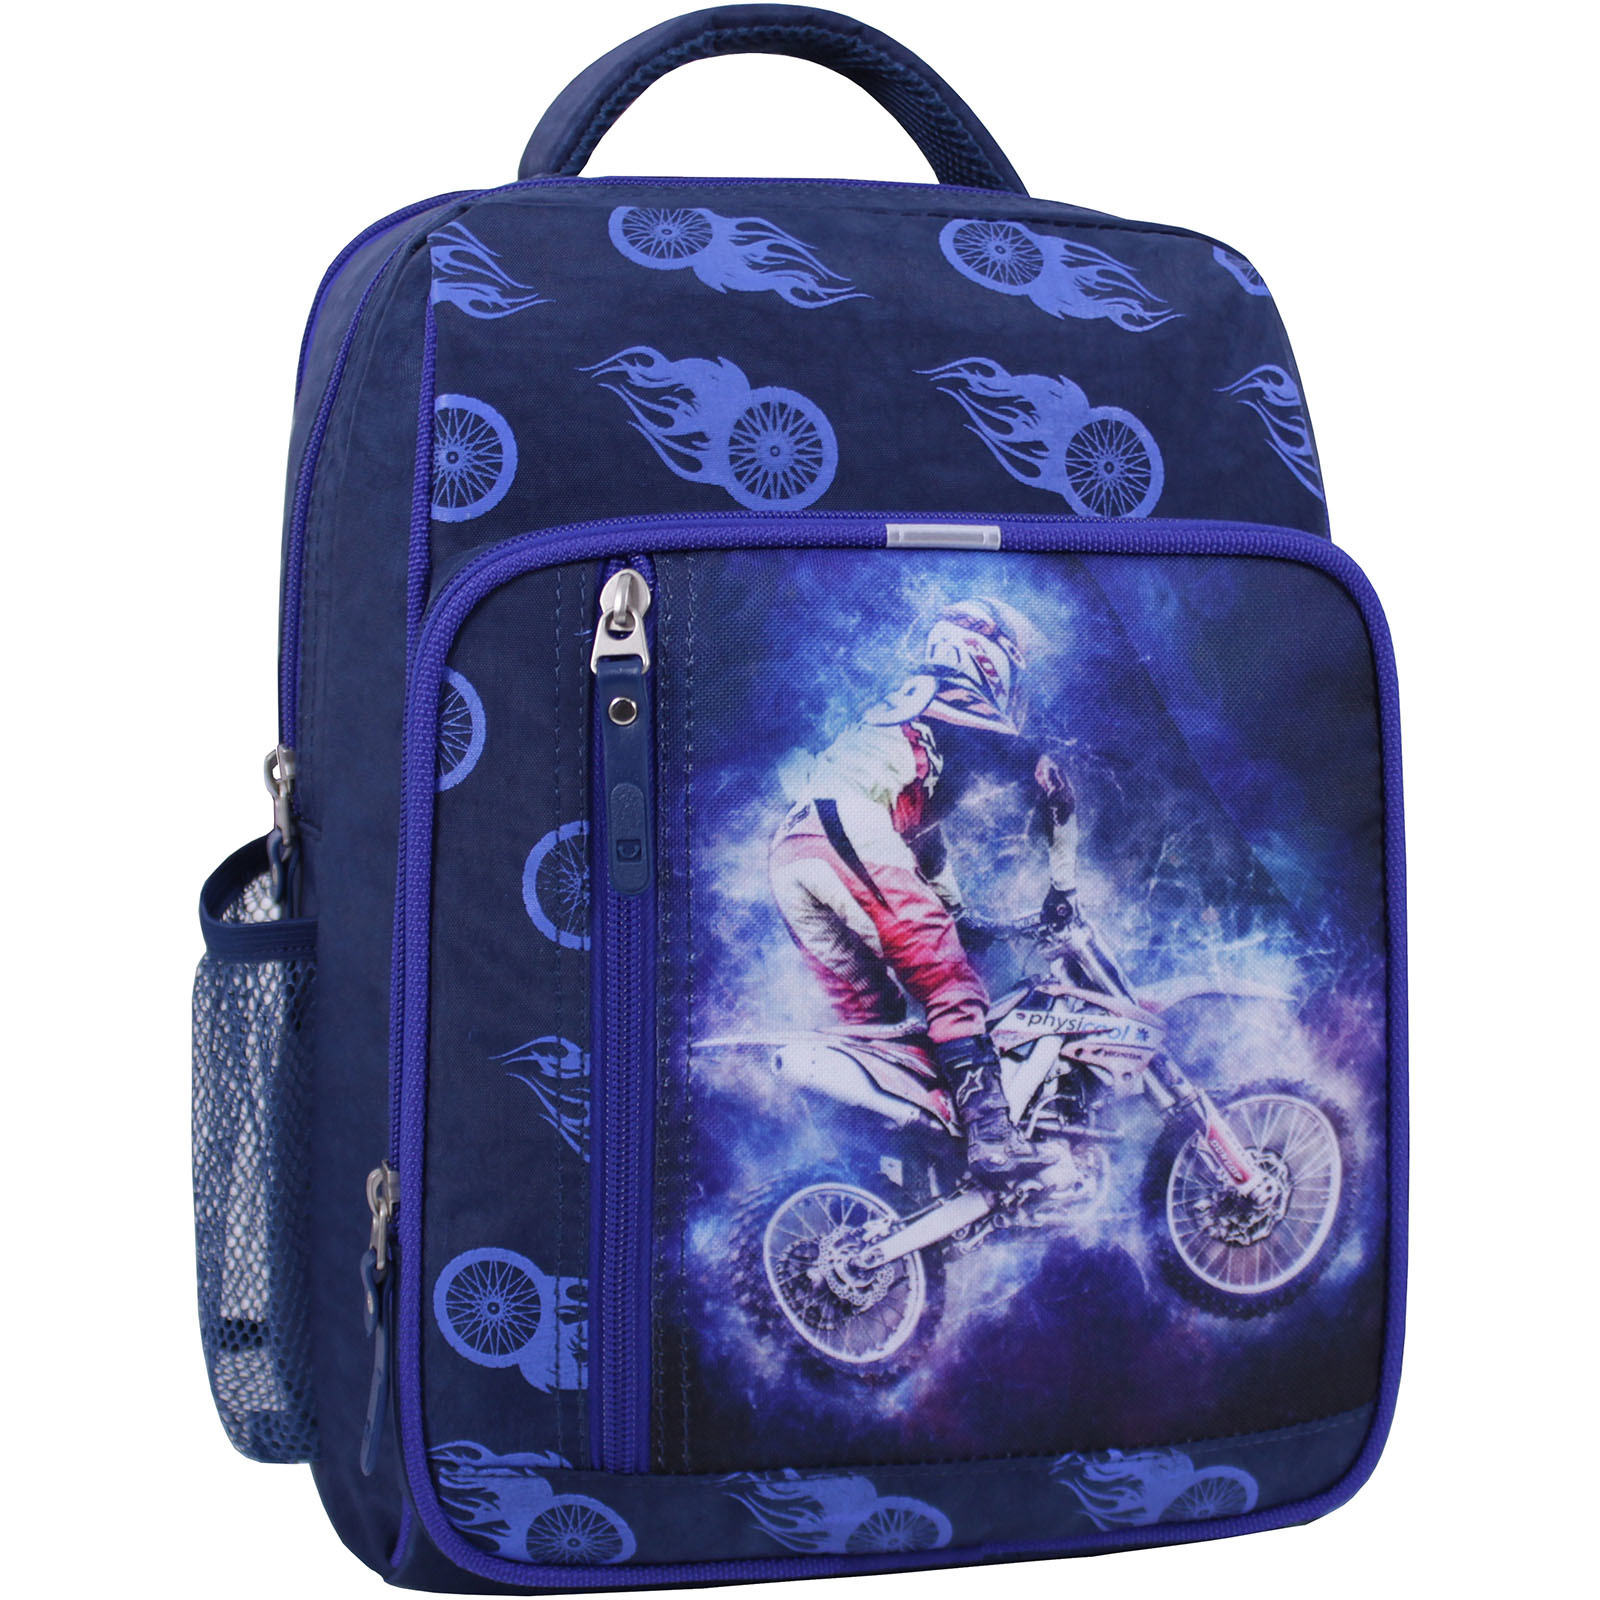 Школьные рюкзаки Рюкзак школьный Bagland Школьник 8 л. 225 синий 507 (00112702) IMG_1670_СУБ.507_.JPG